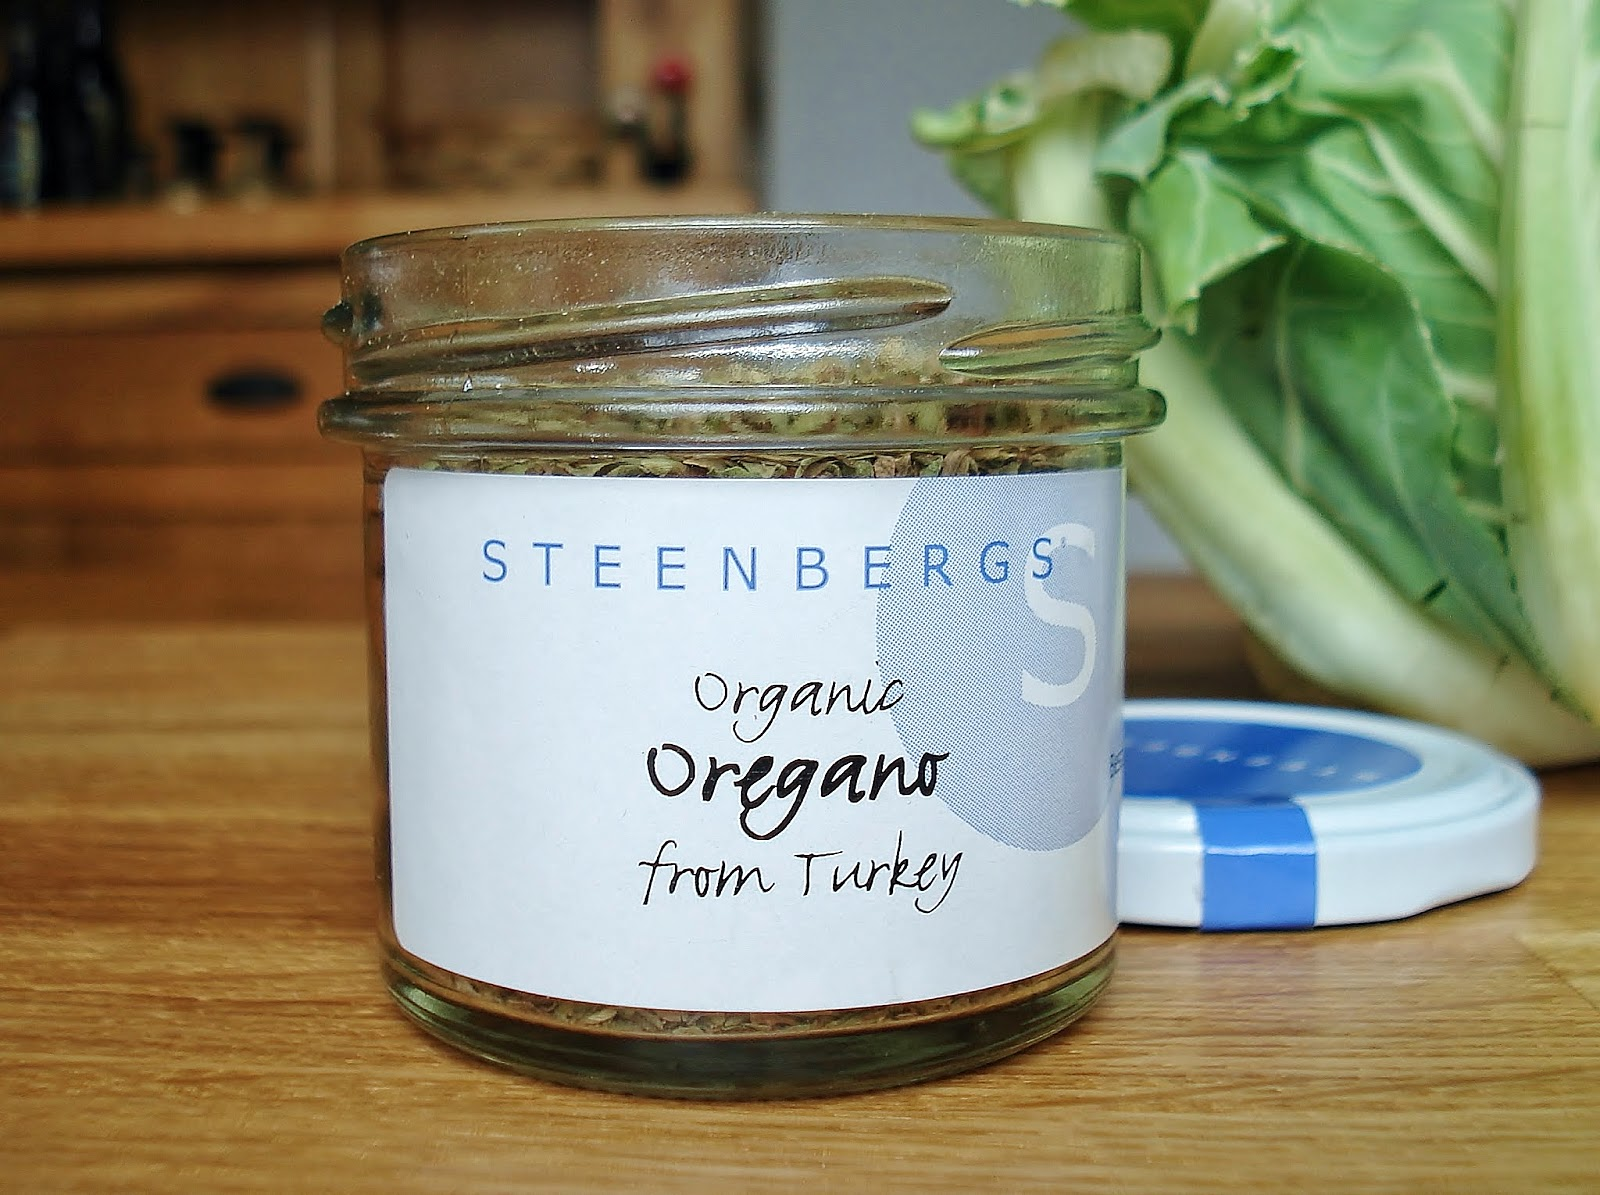 Steenbergs organic oregano jar